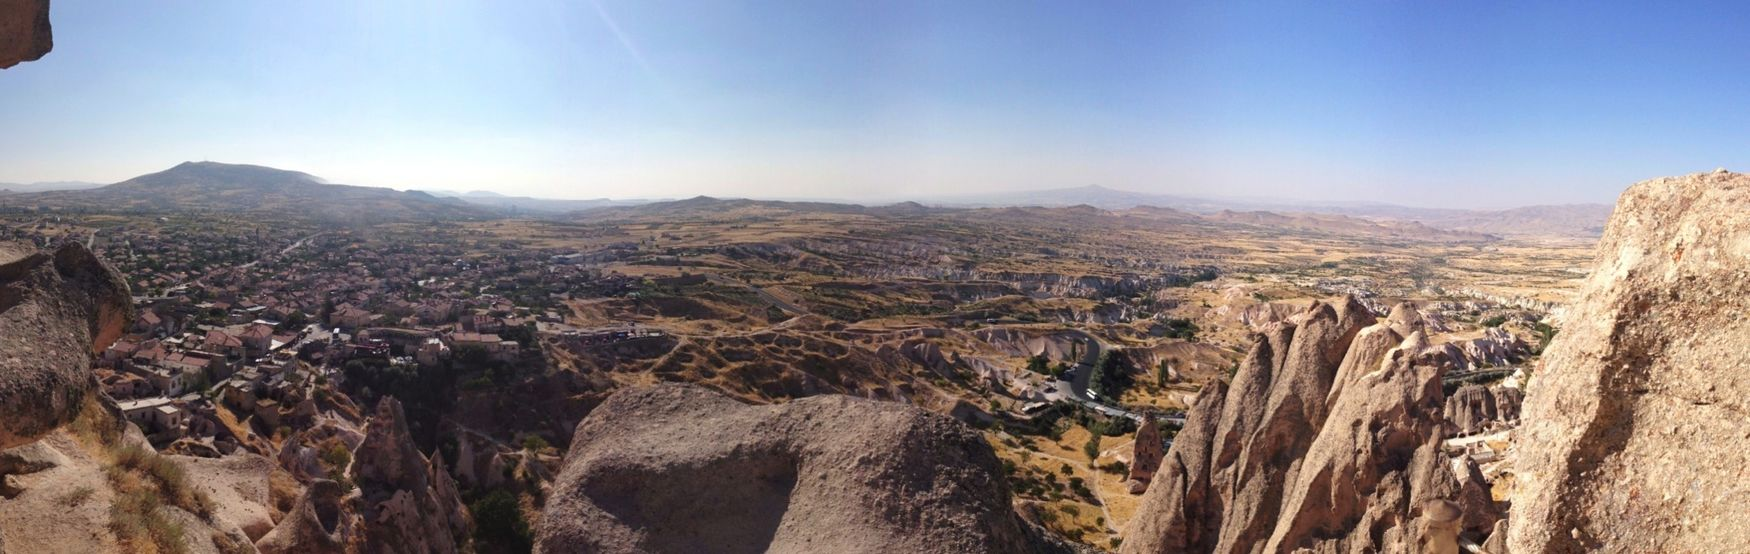 View from Uchisar Castle Castle Kapadokya Cappadocia Turkey